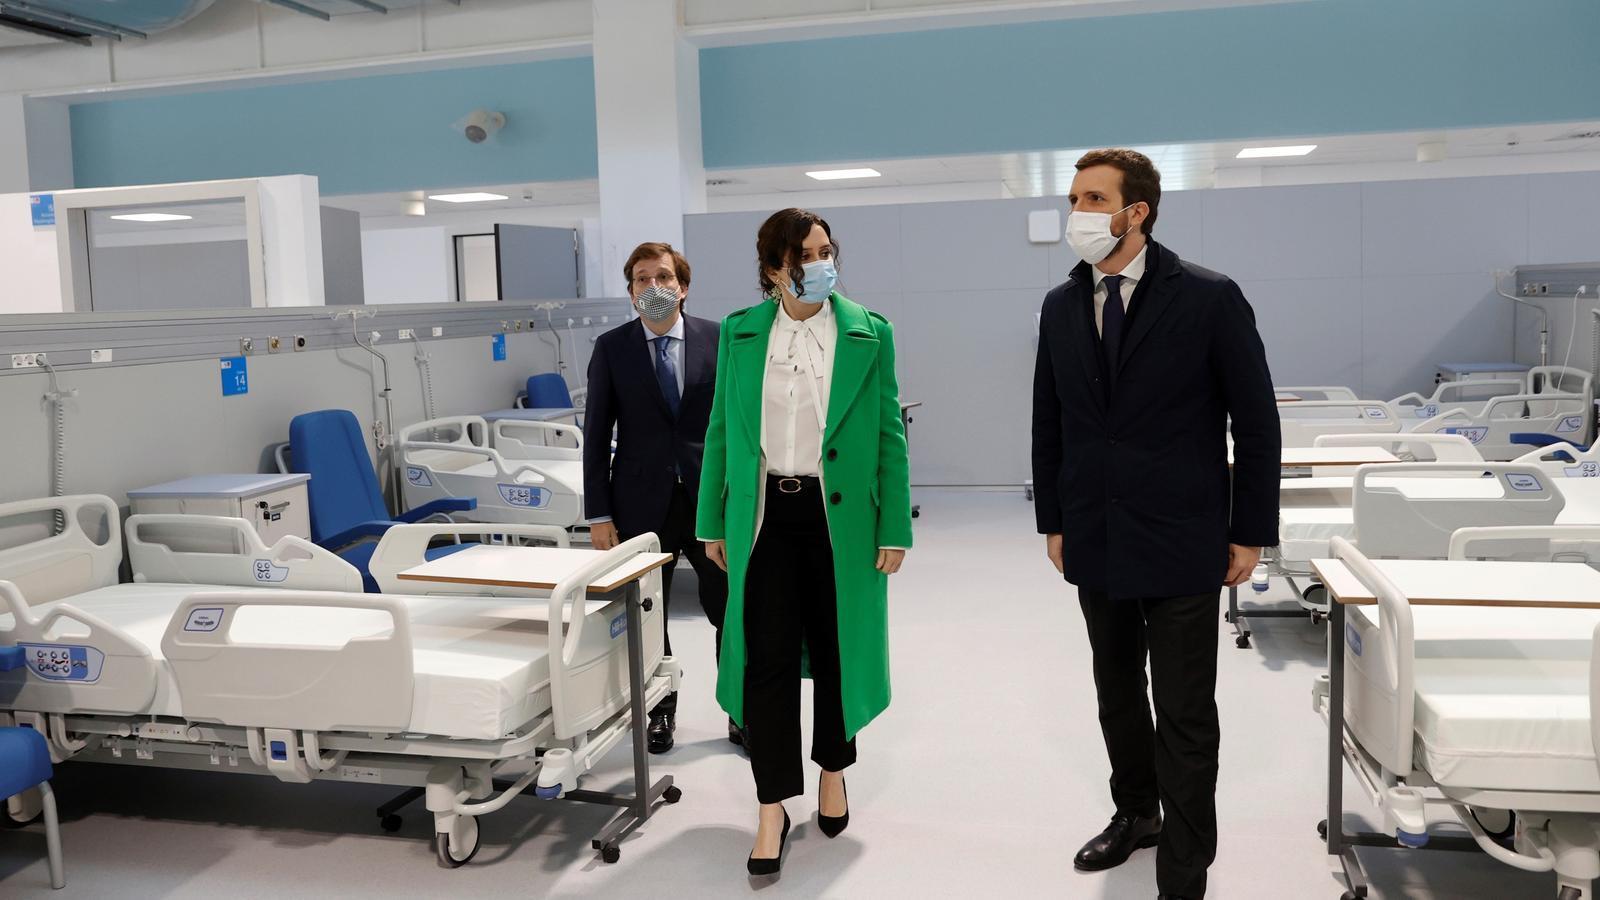 Almeida, Ayuso i Casado inaugurant l'hospital Enfermera Isabel Zendal.